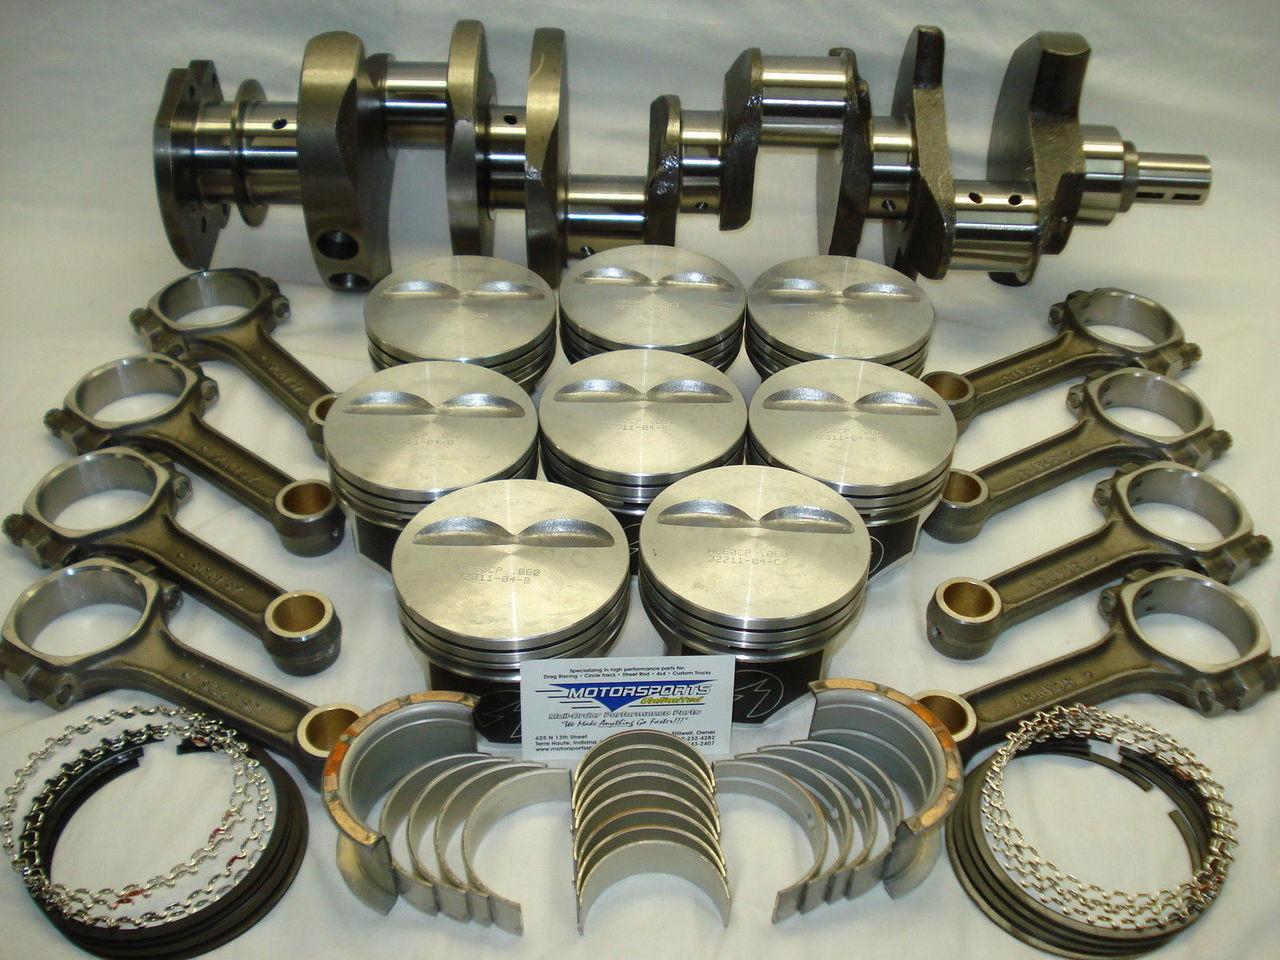 383 Stroker Balanced Rotating Assembly 5 7